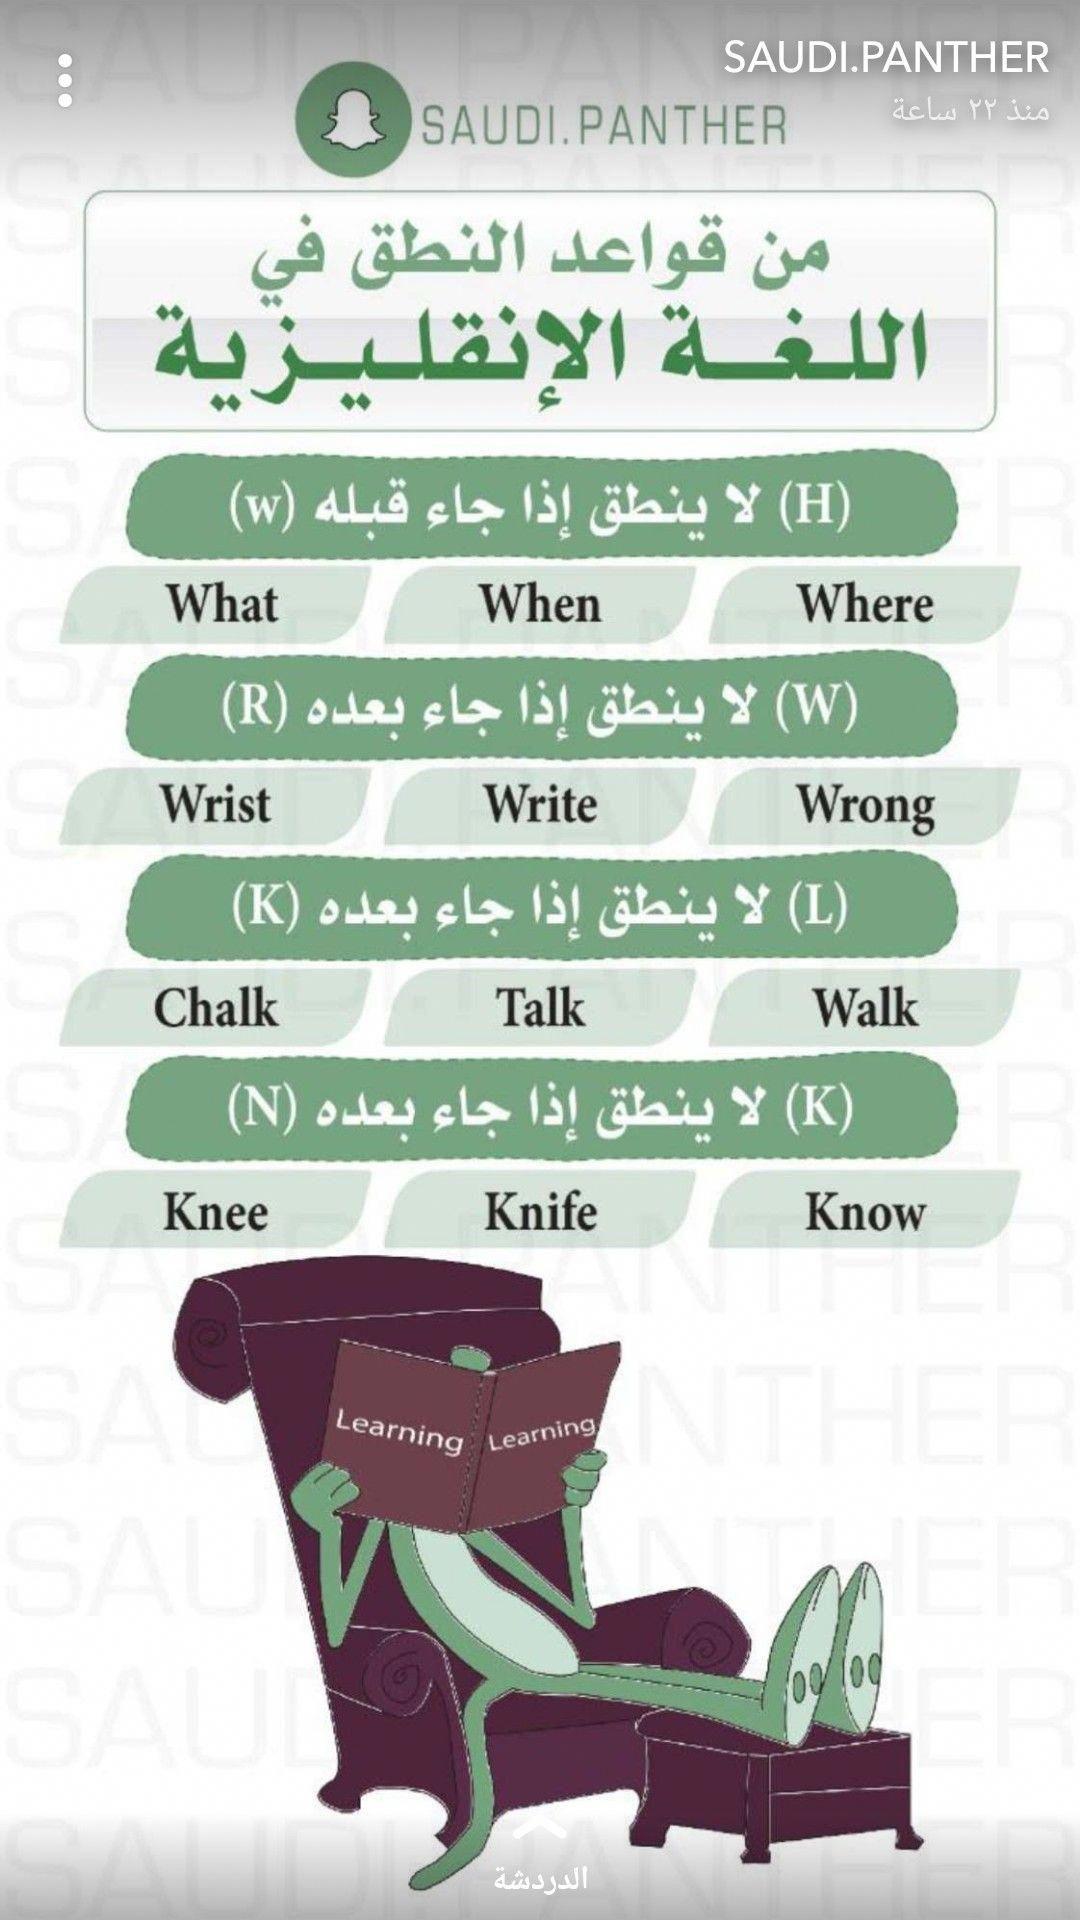 Apprendreanglais Apprendreanglaisenfant Anglaisfacile Coursanglais Parle English Language Learning Grammar English Language Learning English Language Learners